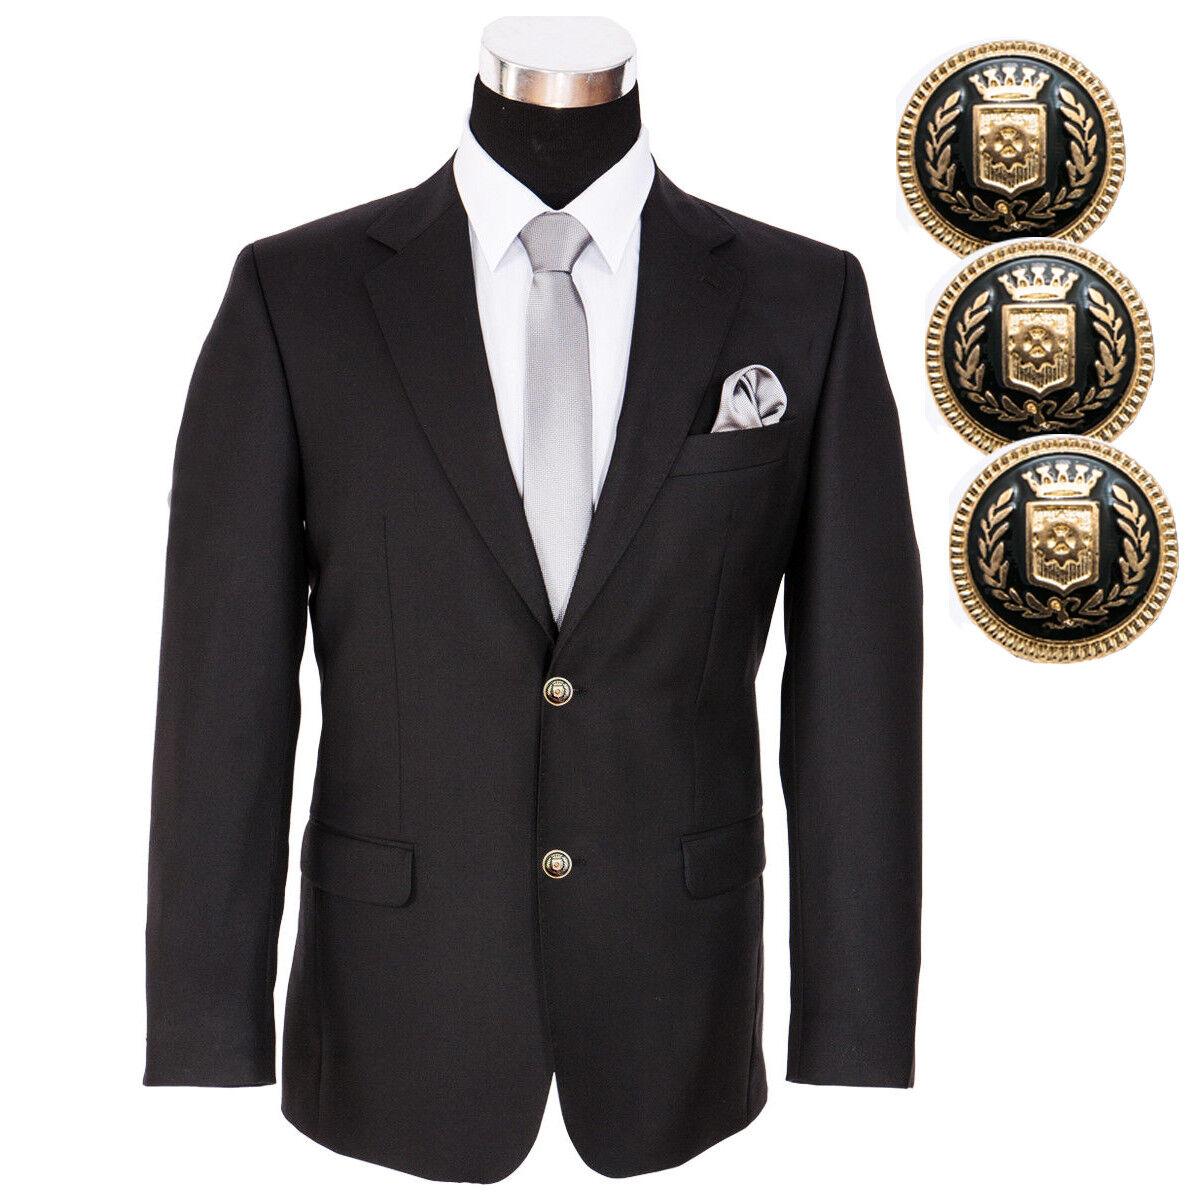 Herren Sakko Herrensakko Club Sakko Geschäft Moden Herren Blazer  Geschäft Mode